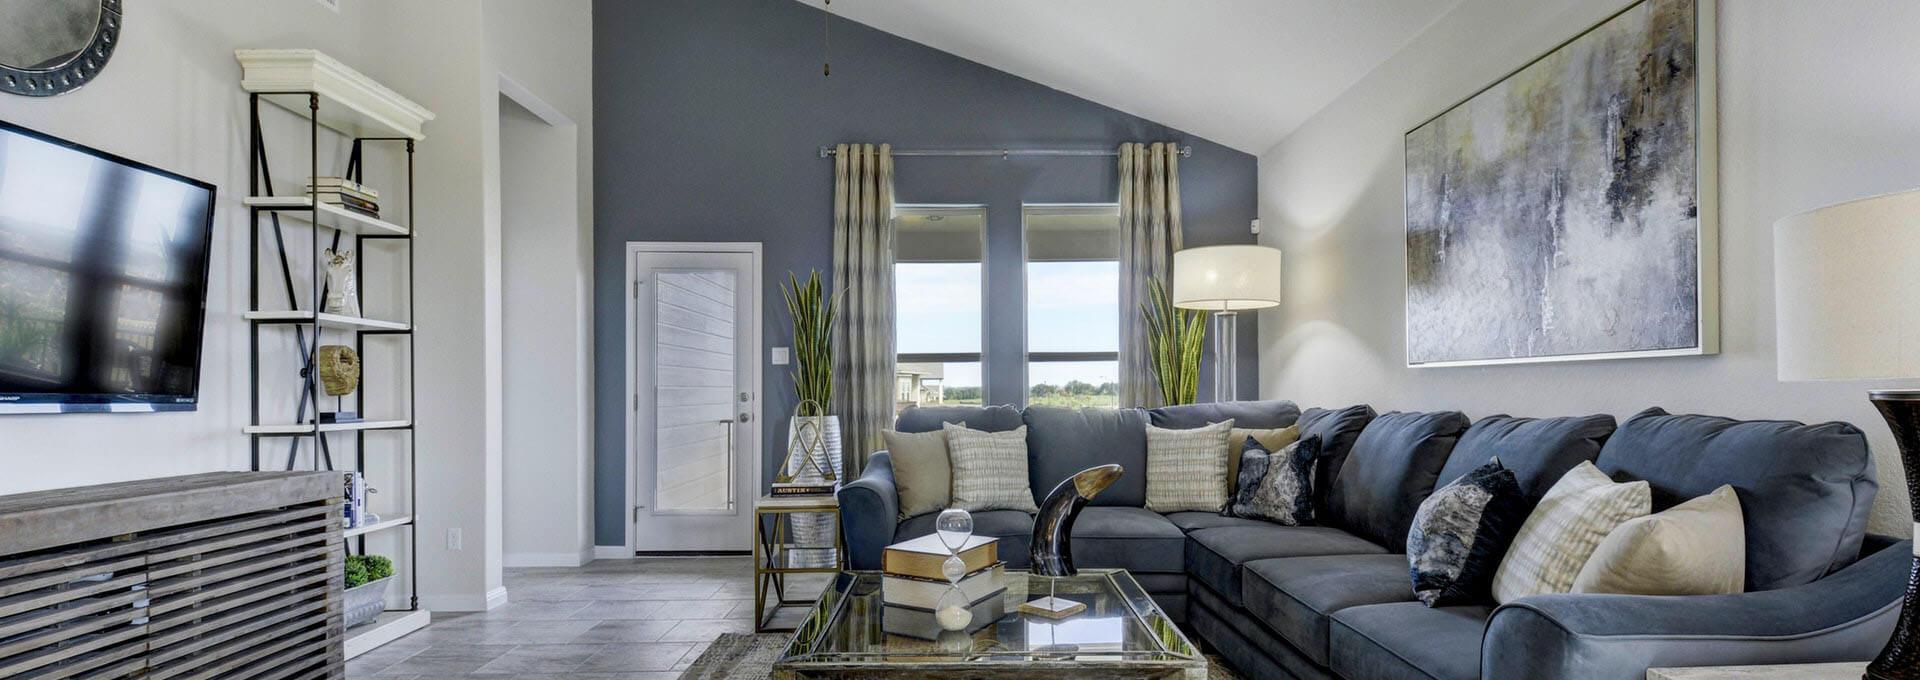 The aaron living room